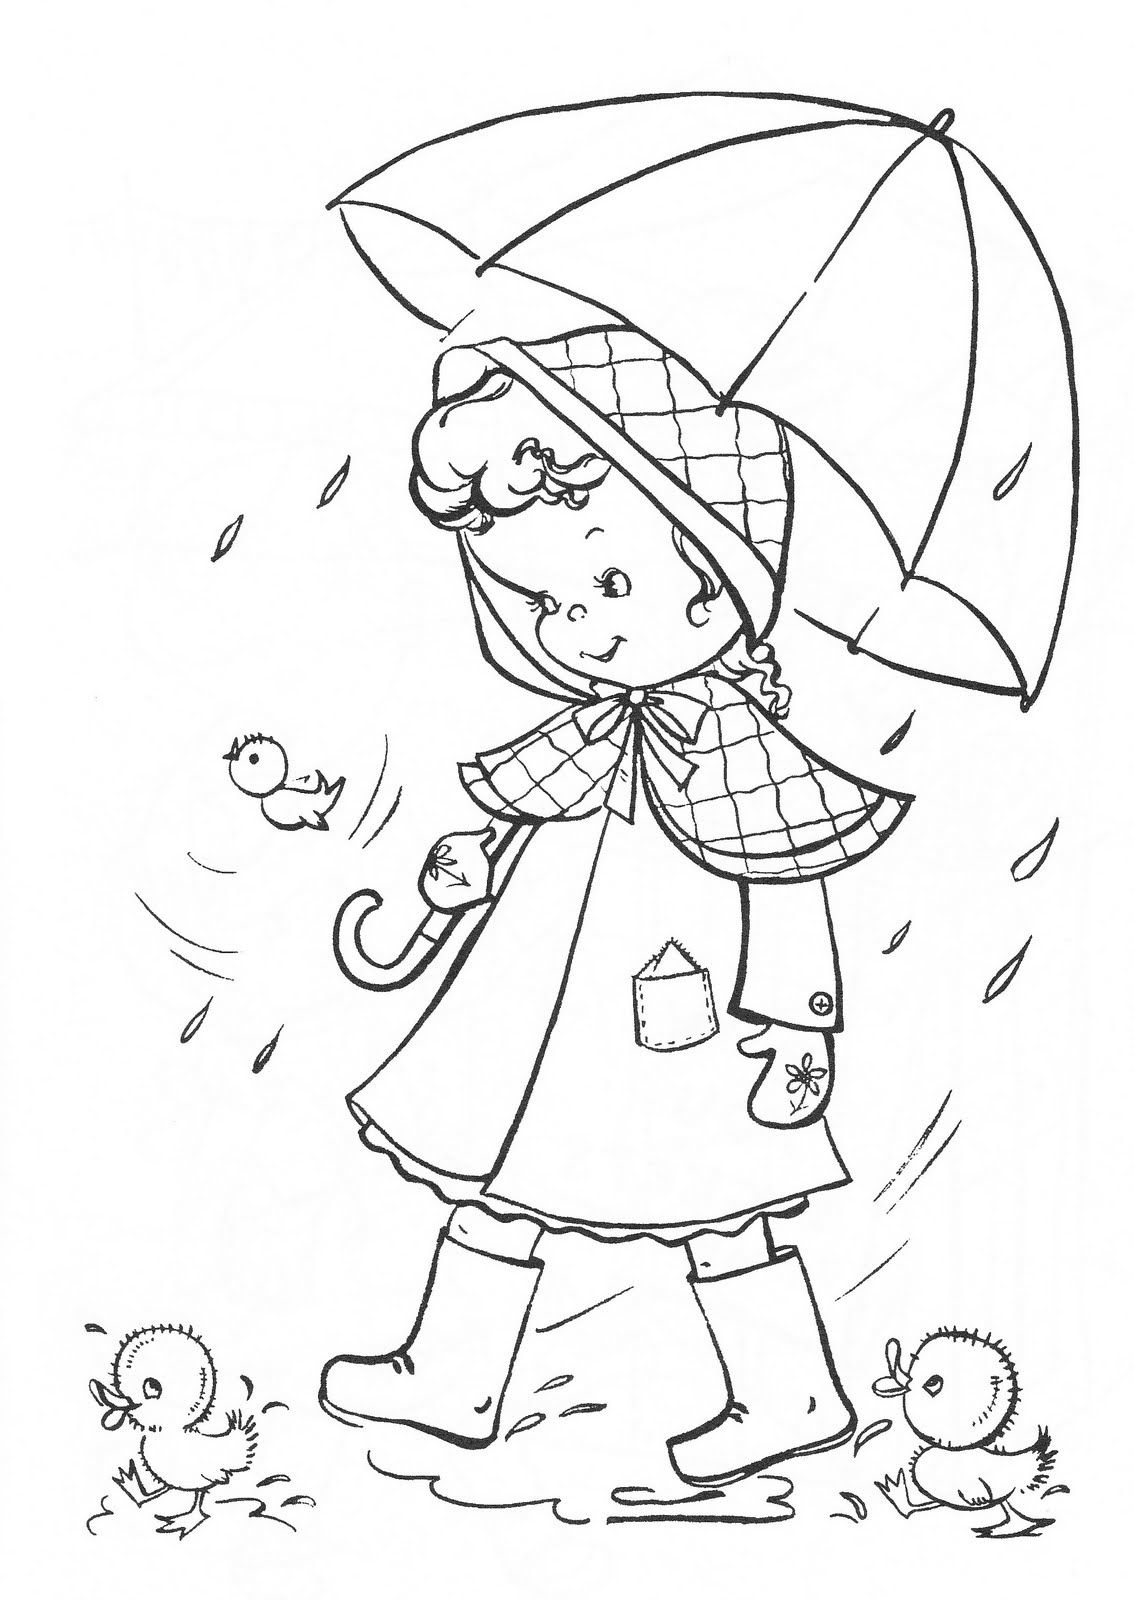 Blue Bonnet | Lluvia y sombrillas y parasoles | Pinterest | Lluvia ...